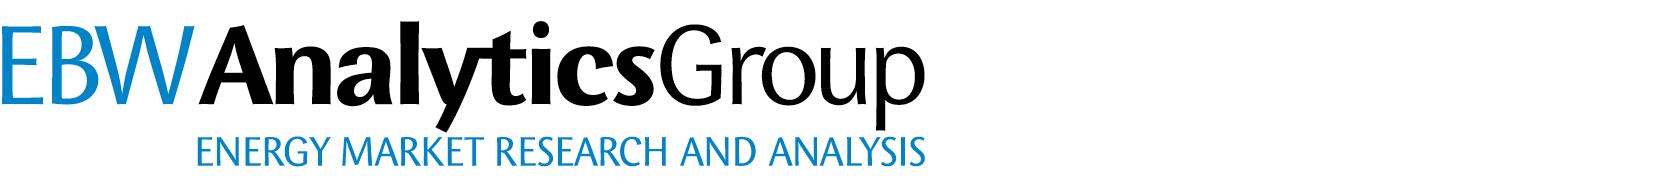 EBW Analytics Group Logo BLUE no slogan.png